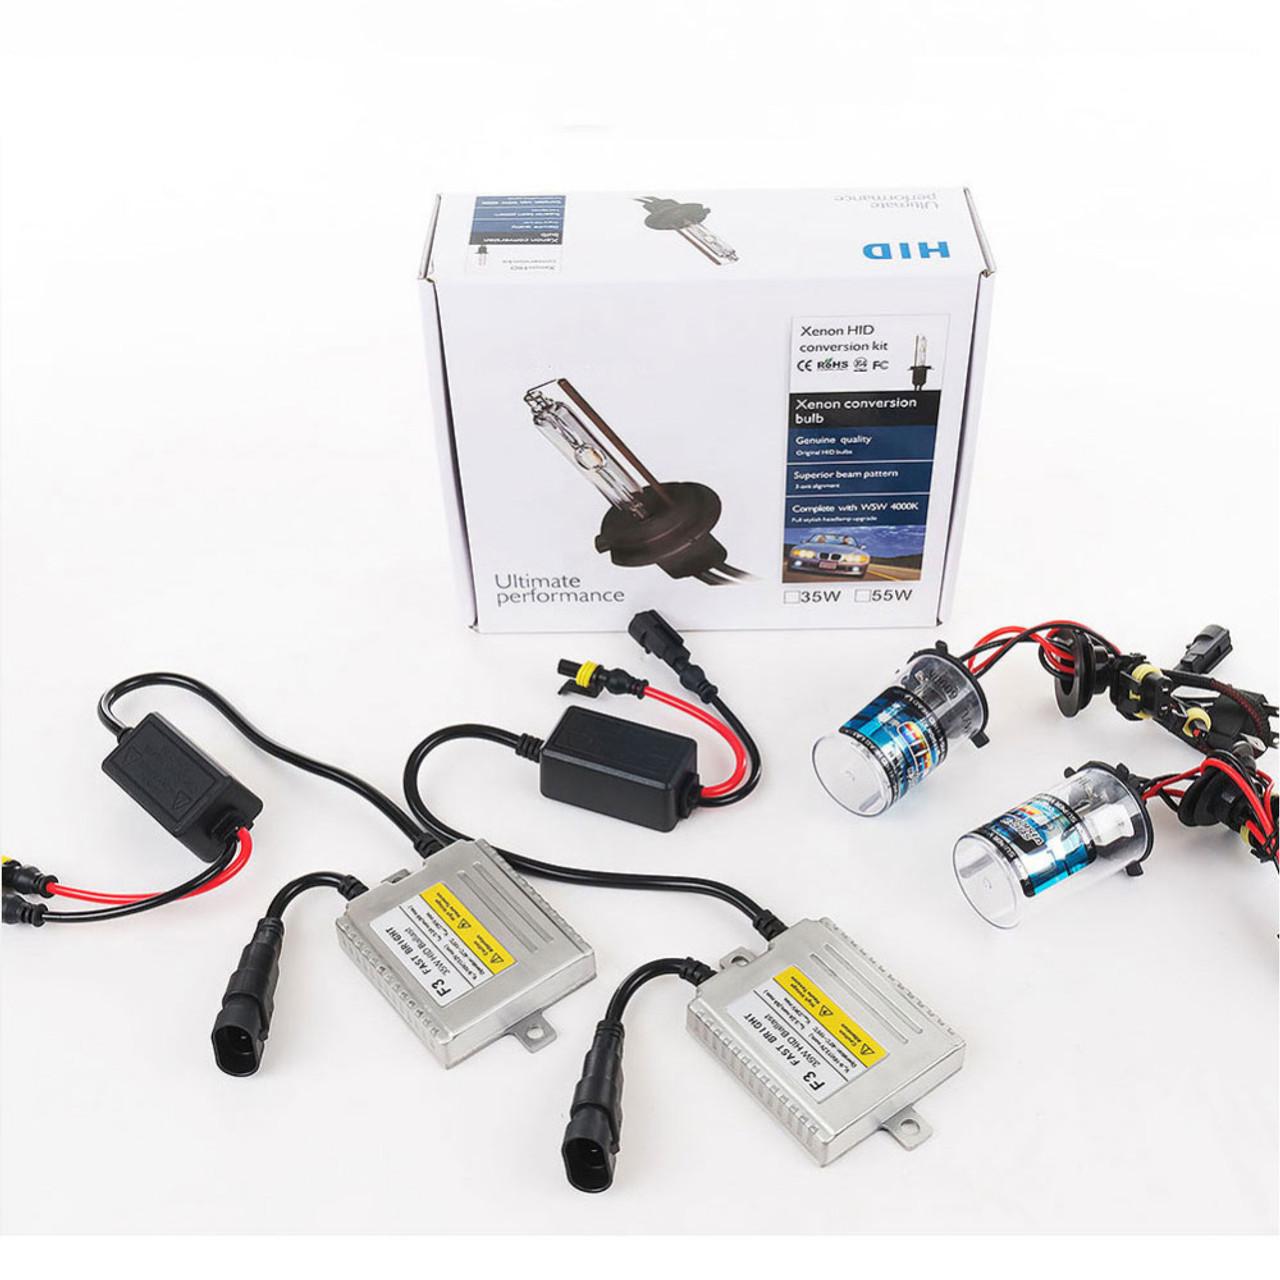 0 1 seconds fast bright h1 xenon f3 ac12v 35w xenon lamp hid kit h3 h1 h4 [ 1000 x 1000 Pixel ]